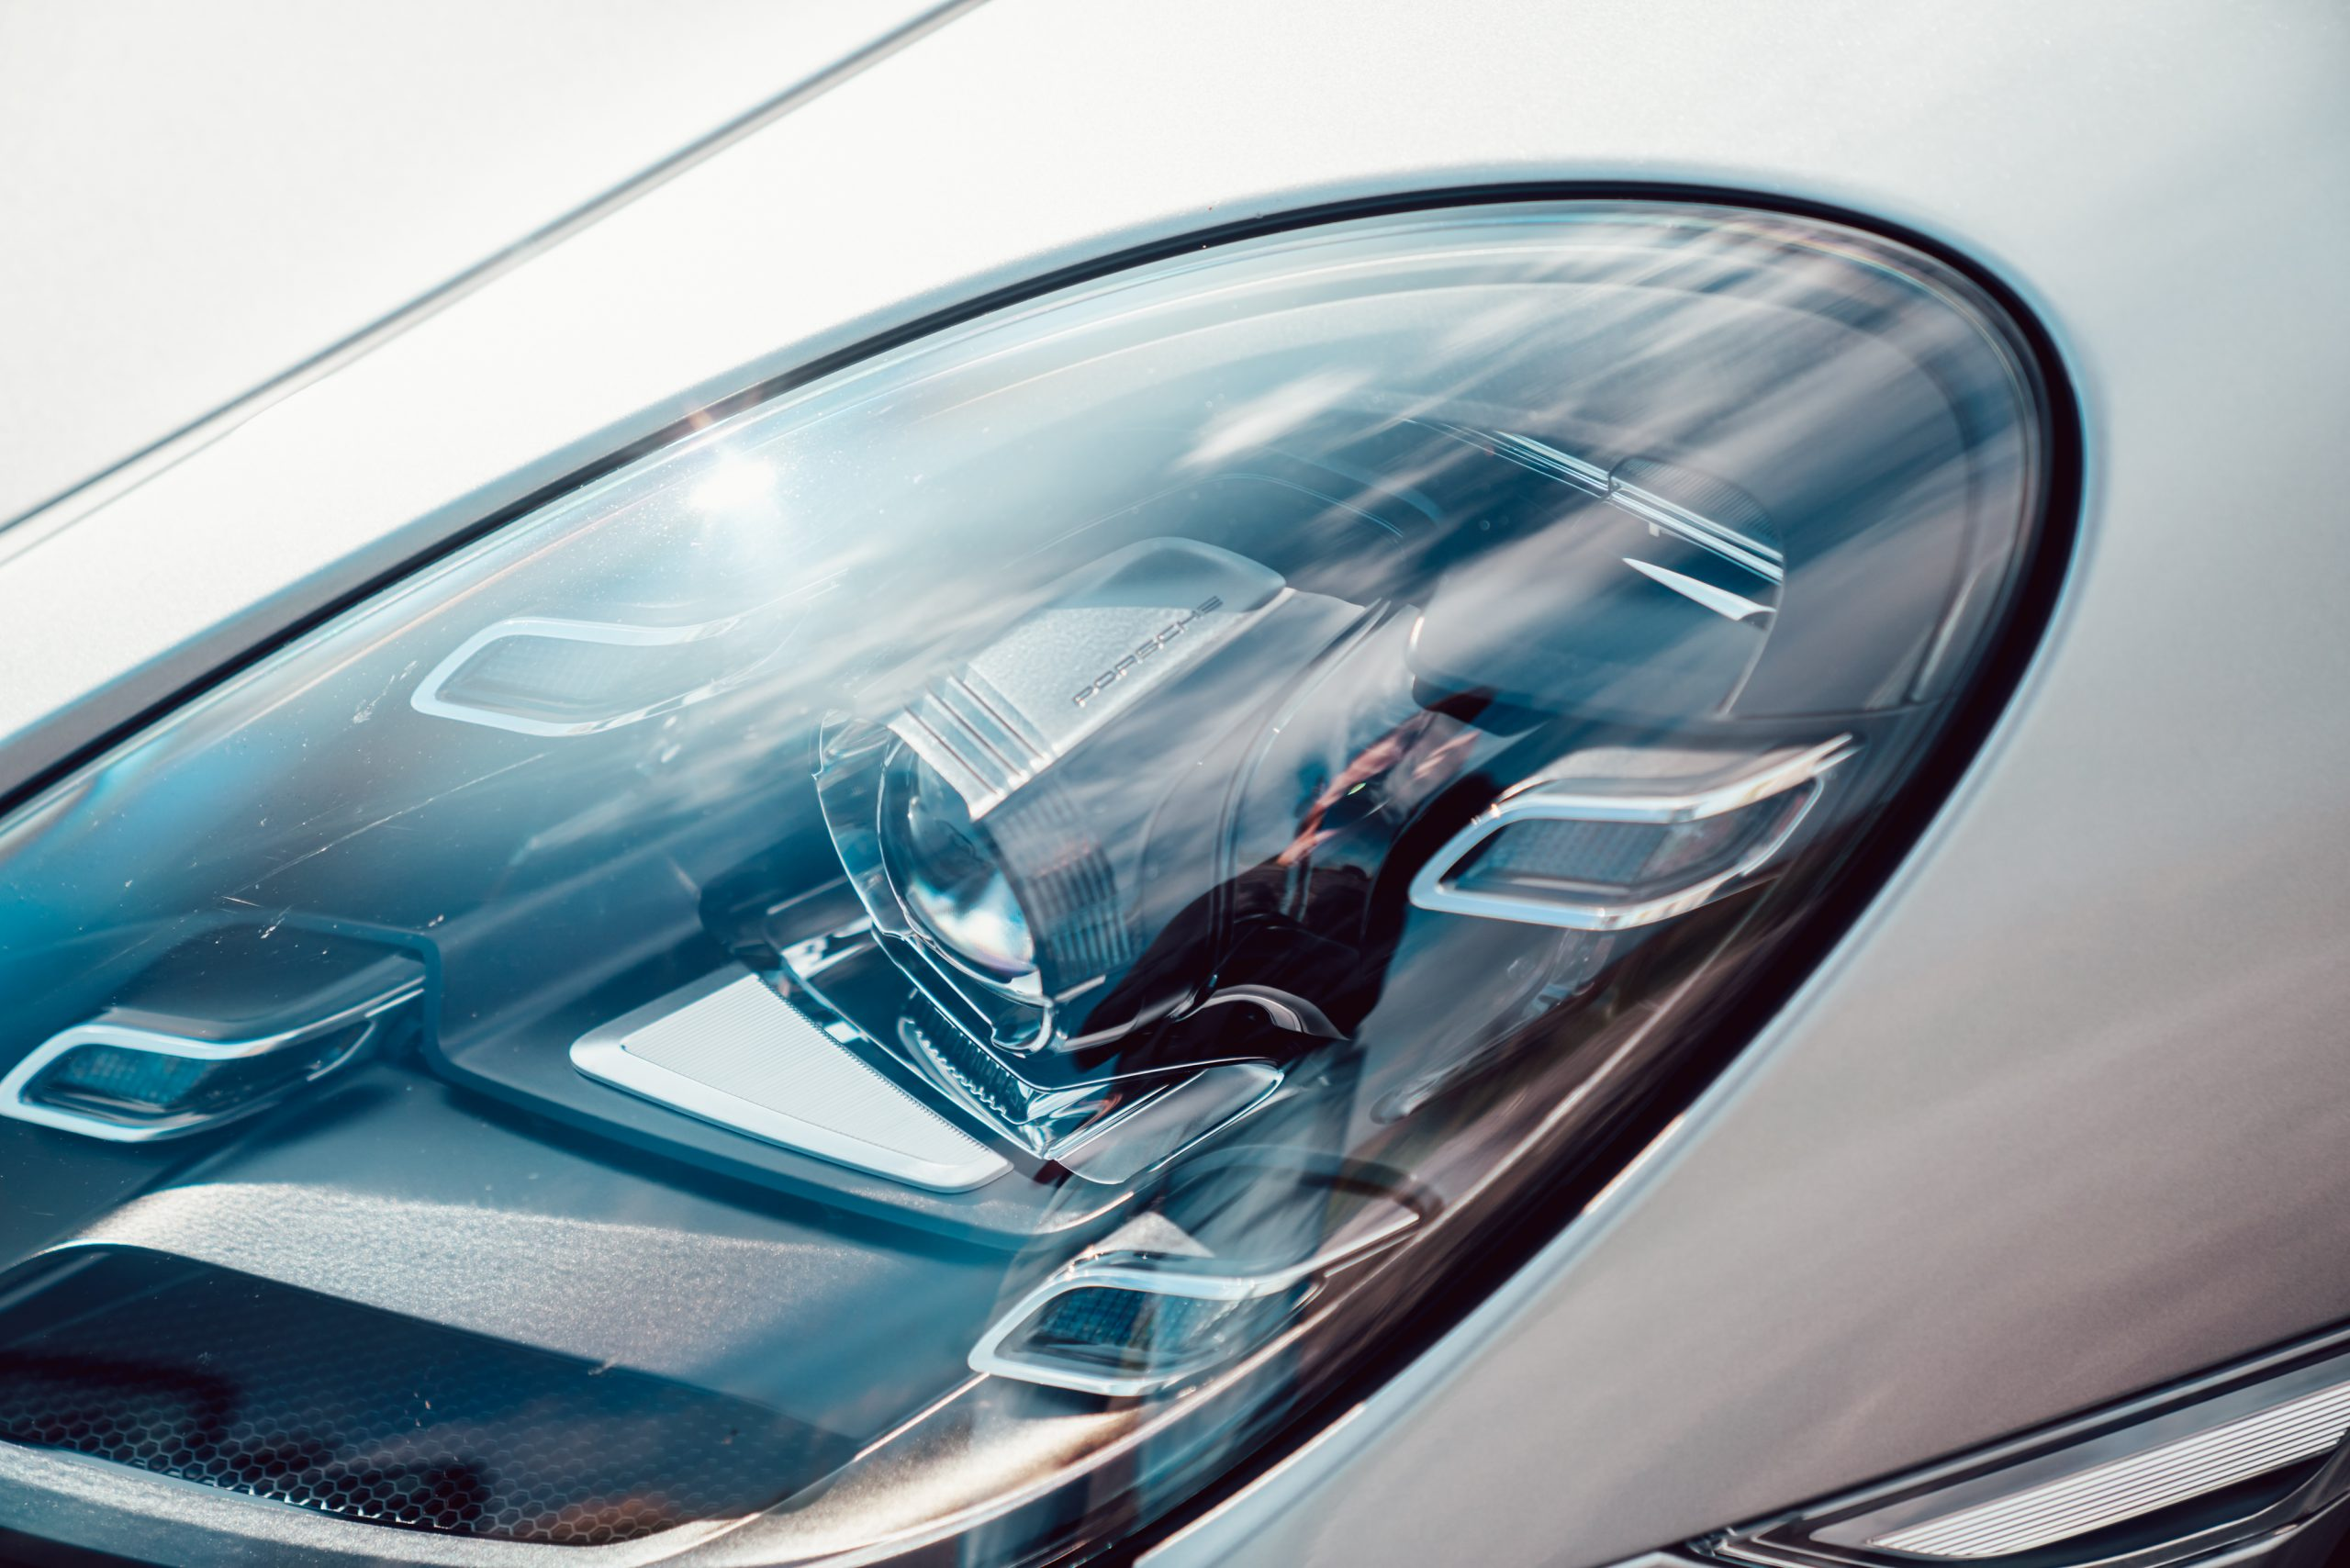 Porsche Boxster 25 headlamp cluster